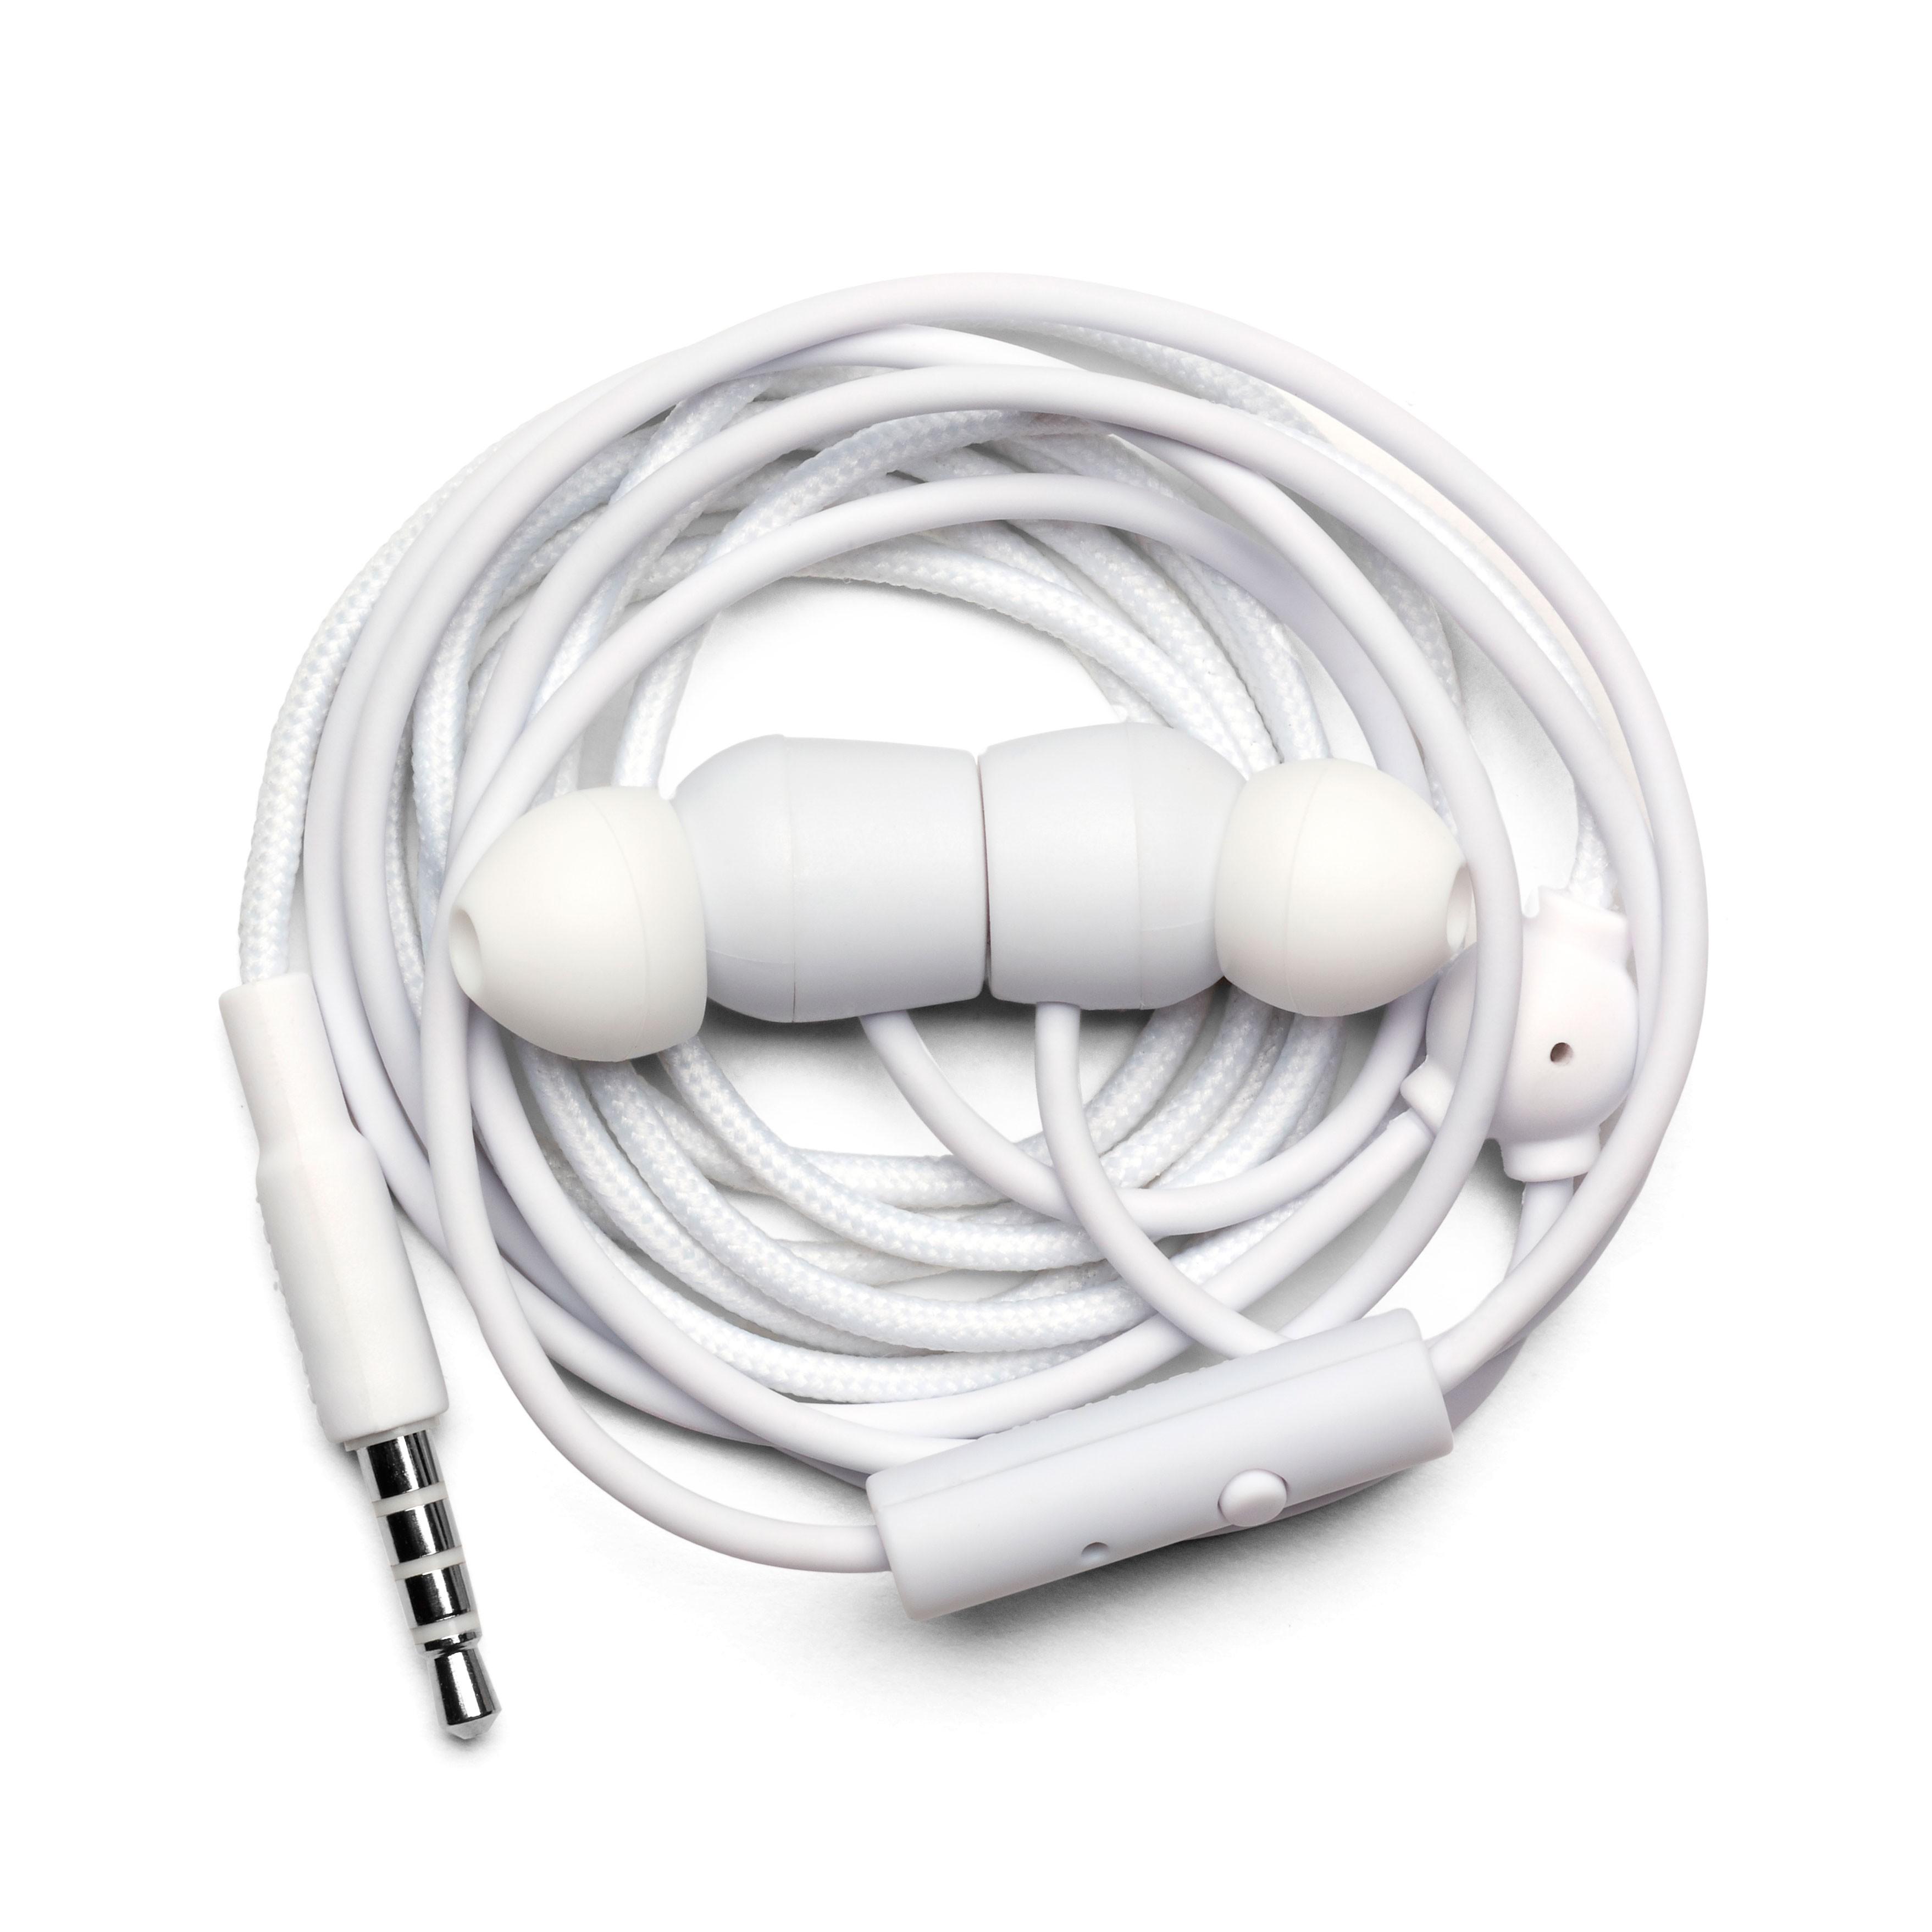 Sluchátka Urbanears Bagis white vel.20 Hz - 20 kHz/107 dB + doručení do 24 hodin